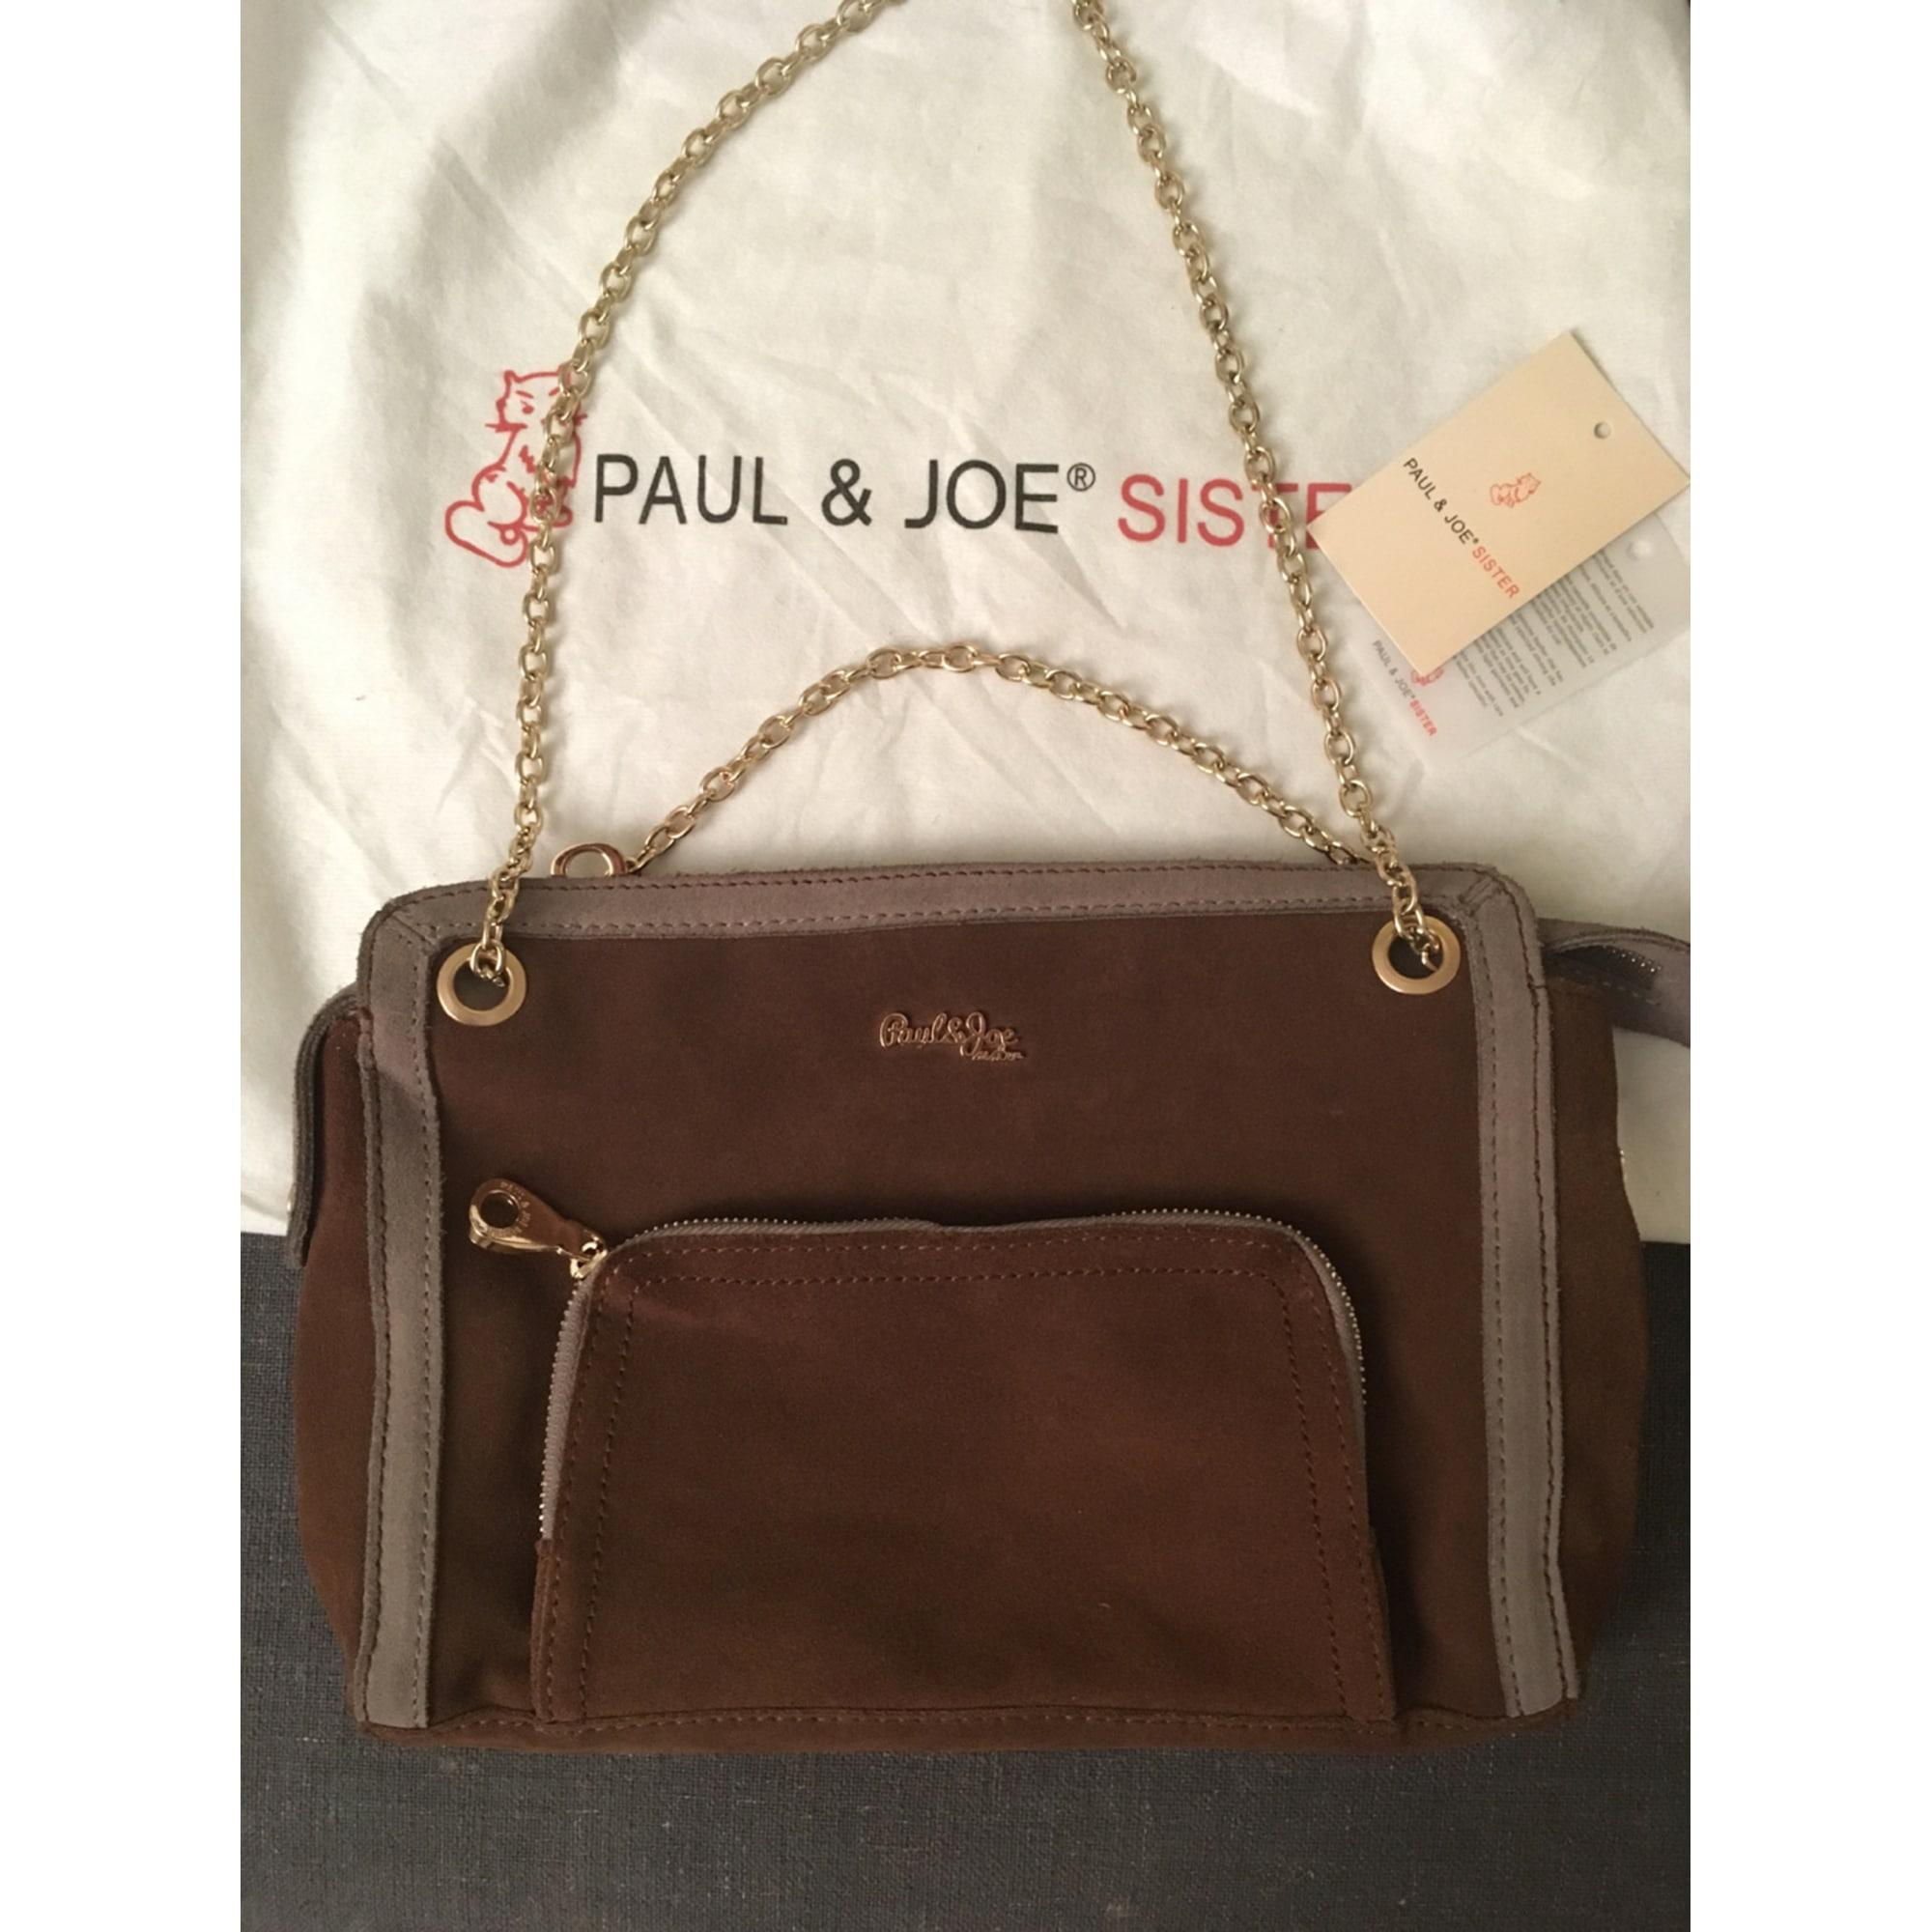 Sac à main en cuir PAUL   JOE SISTER marron - 5833945 7c1a1ea0dbd7